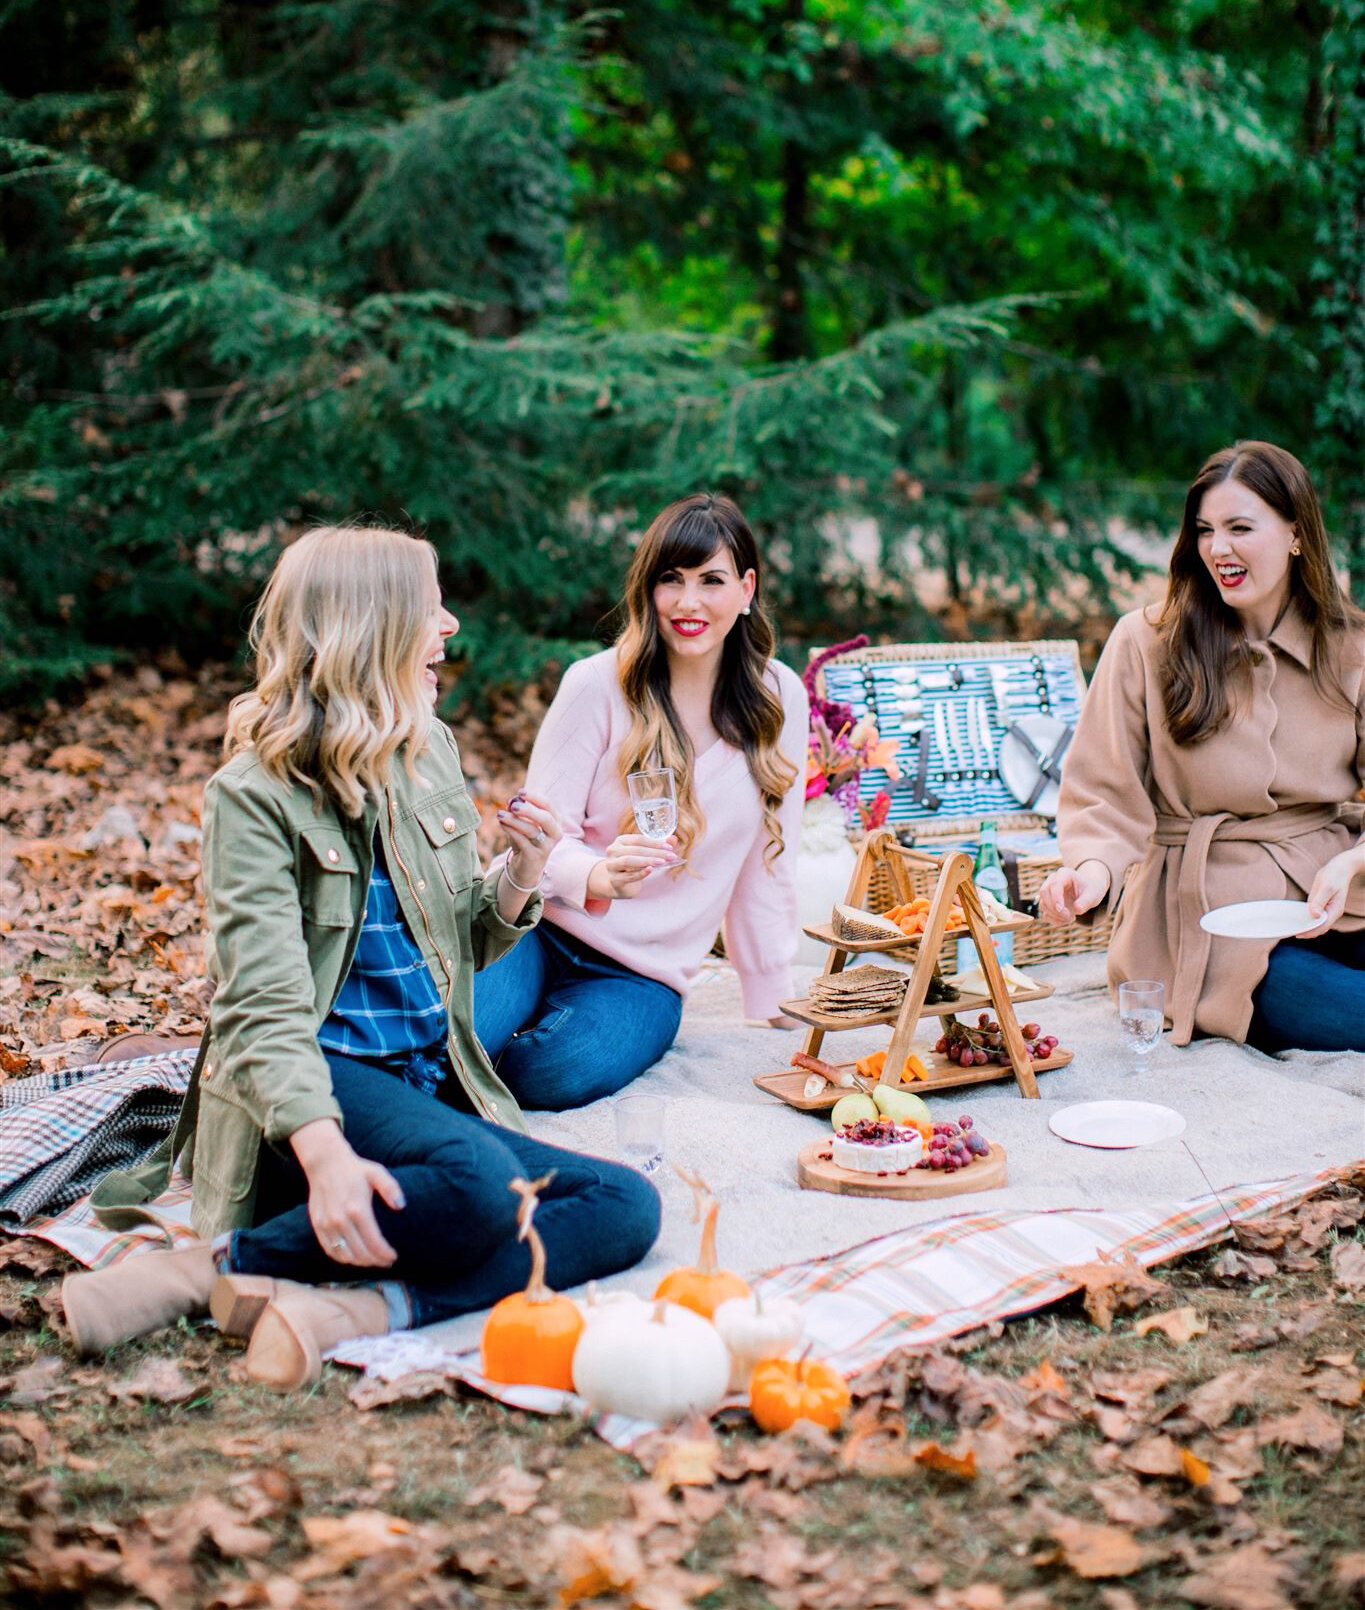 Autumn themed picnic.jpeg